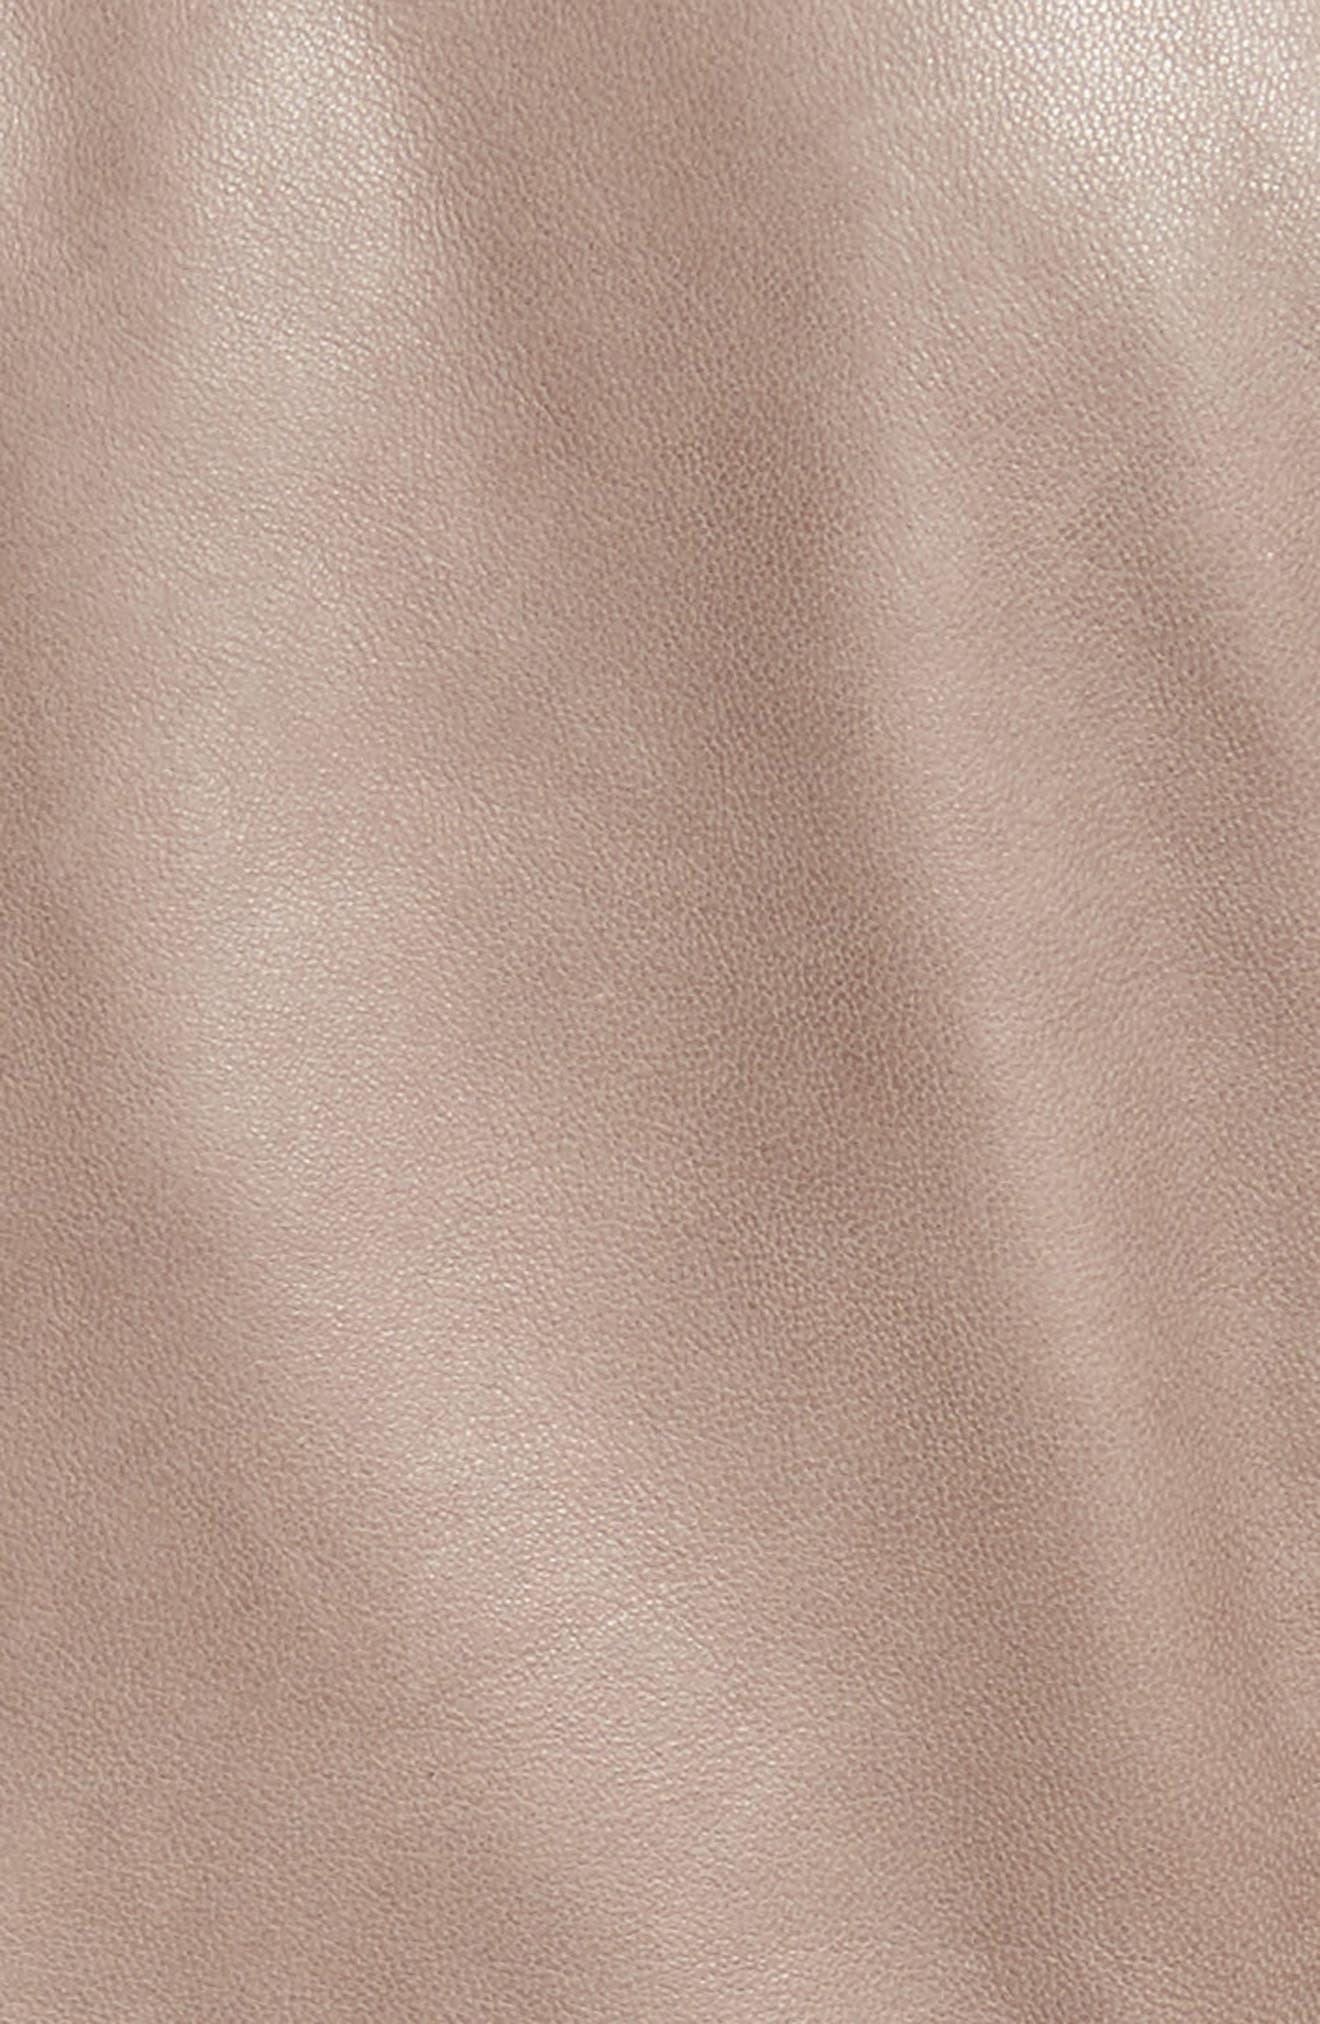 Asymmetrical Leather Jacket,                             Alternate thumbnail 4, color,                             Taupe Dusk